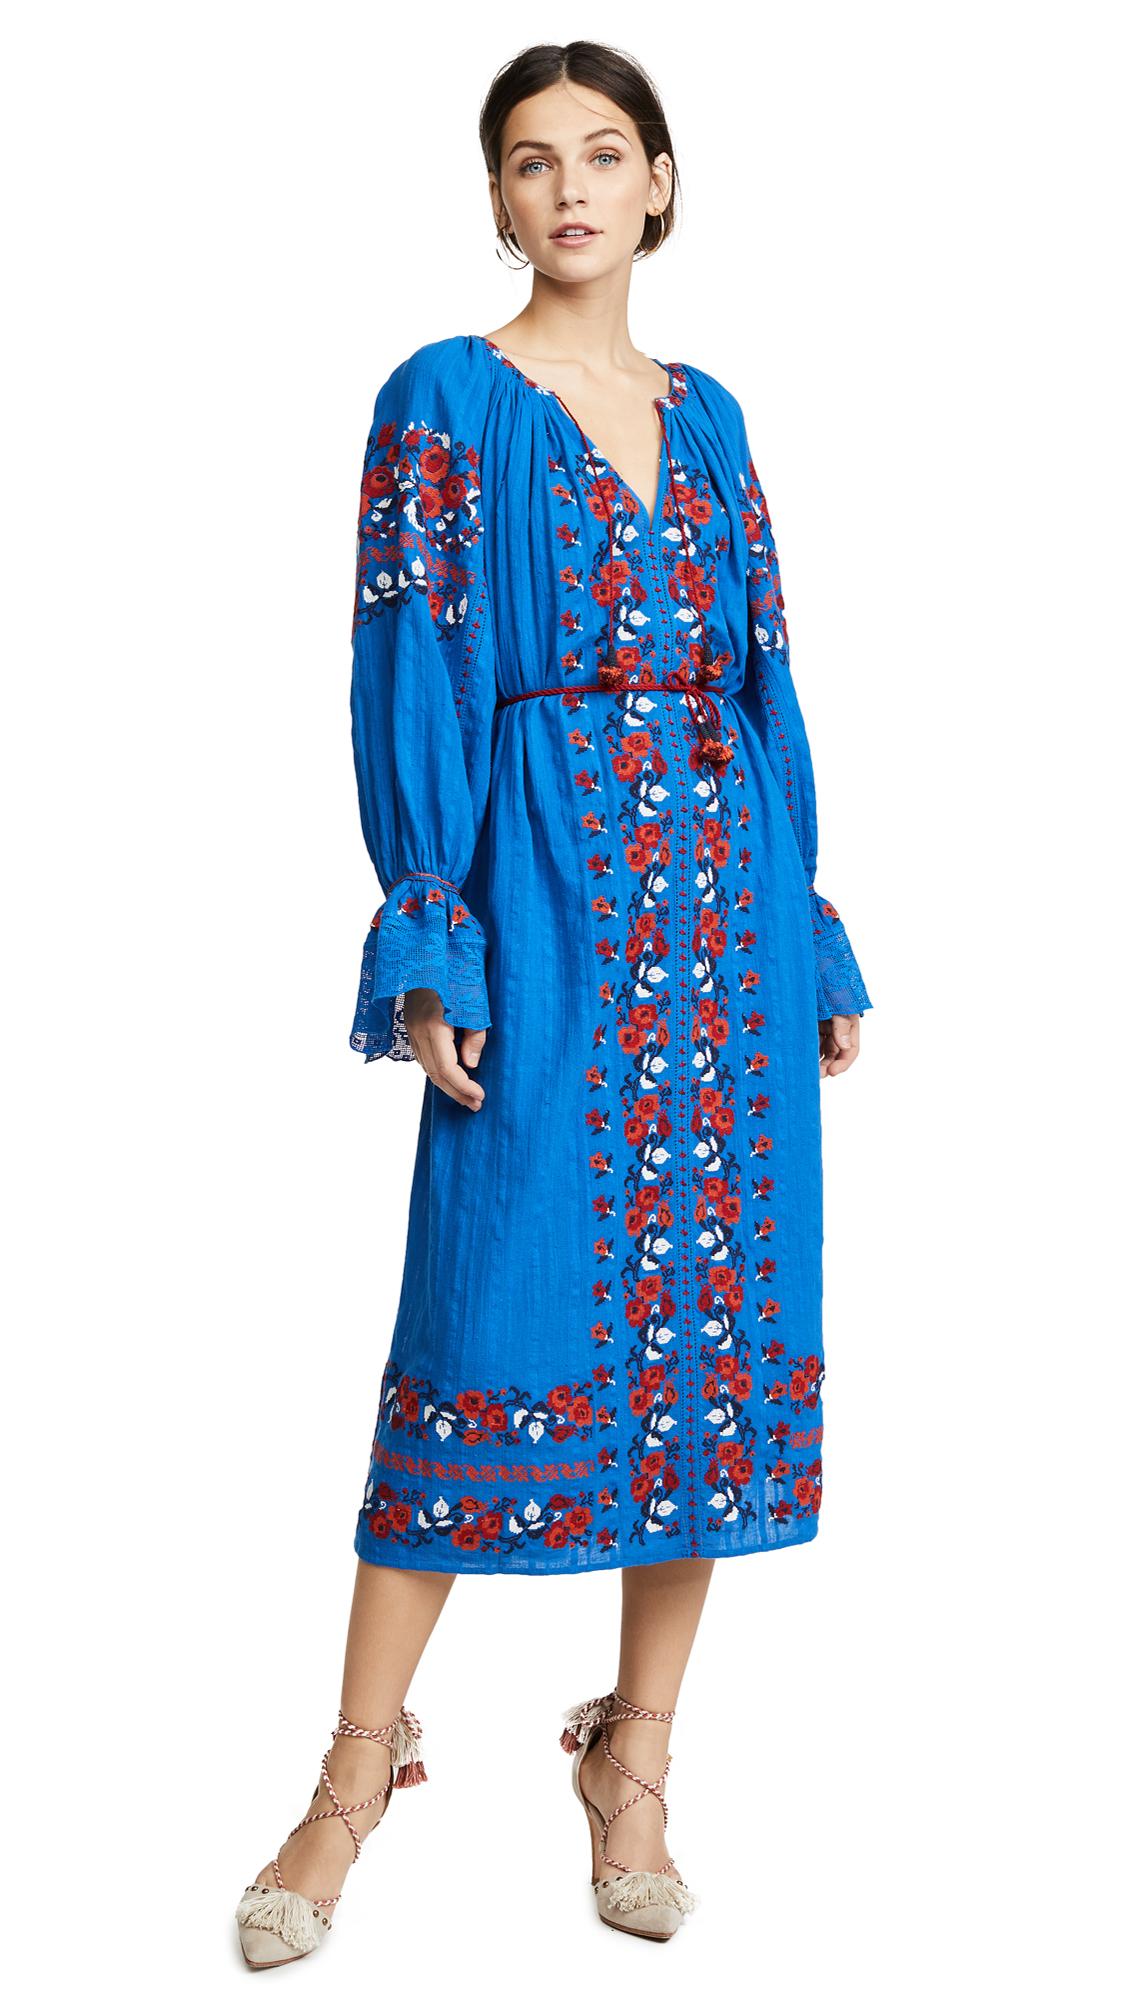 ULLA JOHNSON Filia Embroidered Cotton-Gauze Midi Dress, Cobalt